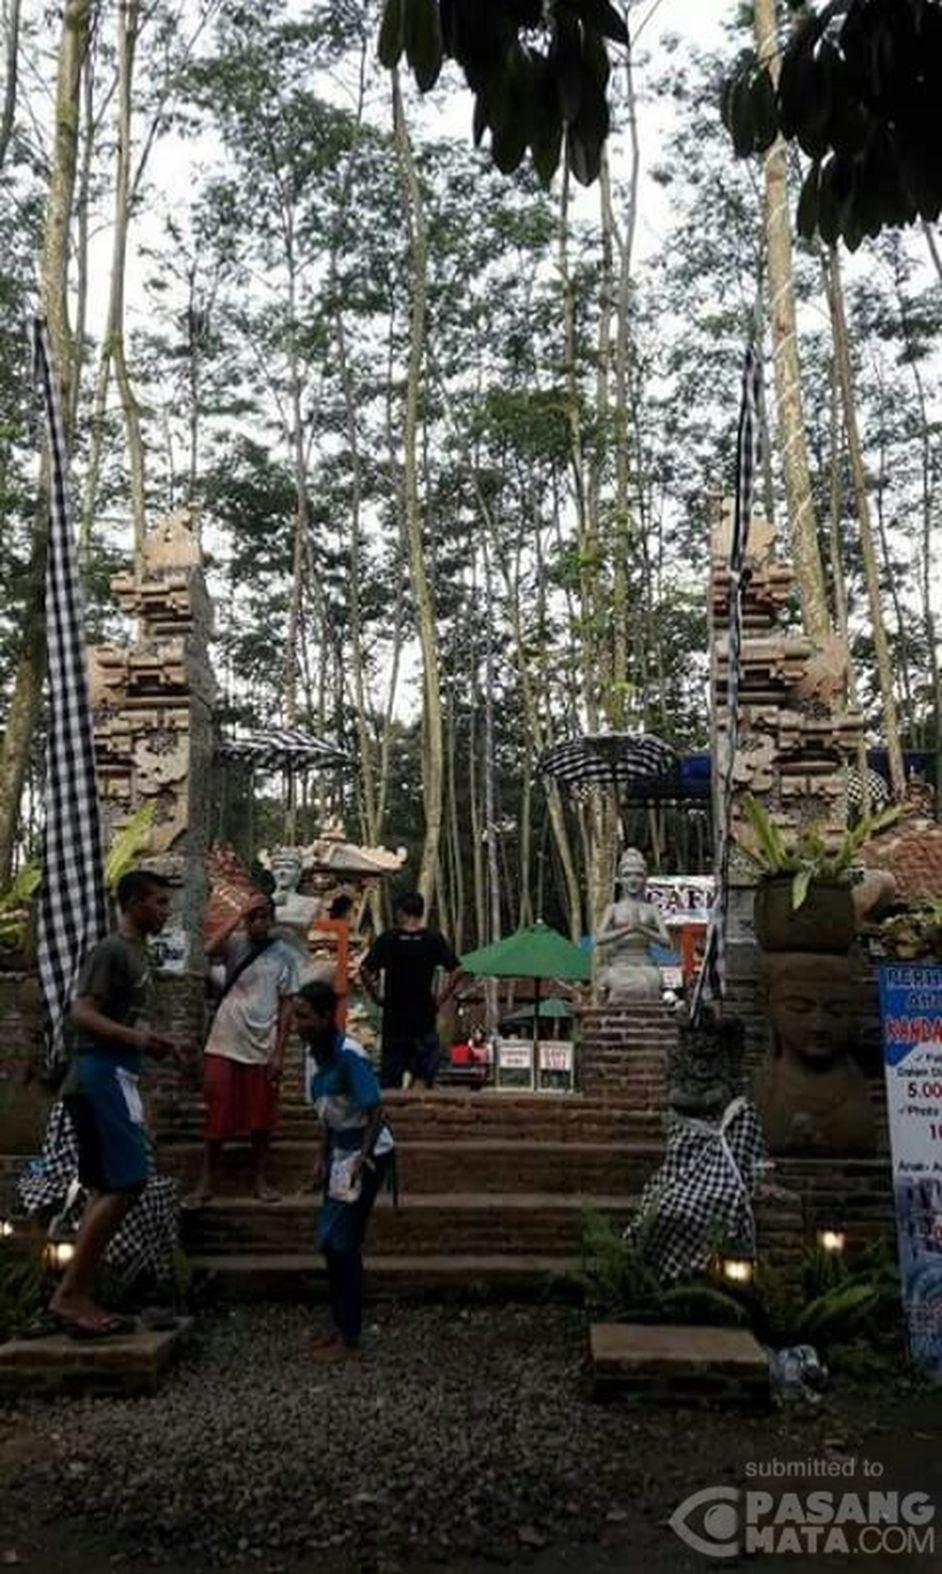 Keren Di Desa Ngabul Jepara Ada Wisata Bernuansa Bali